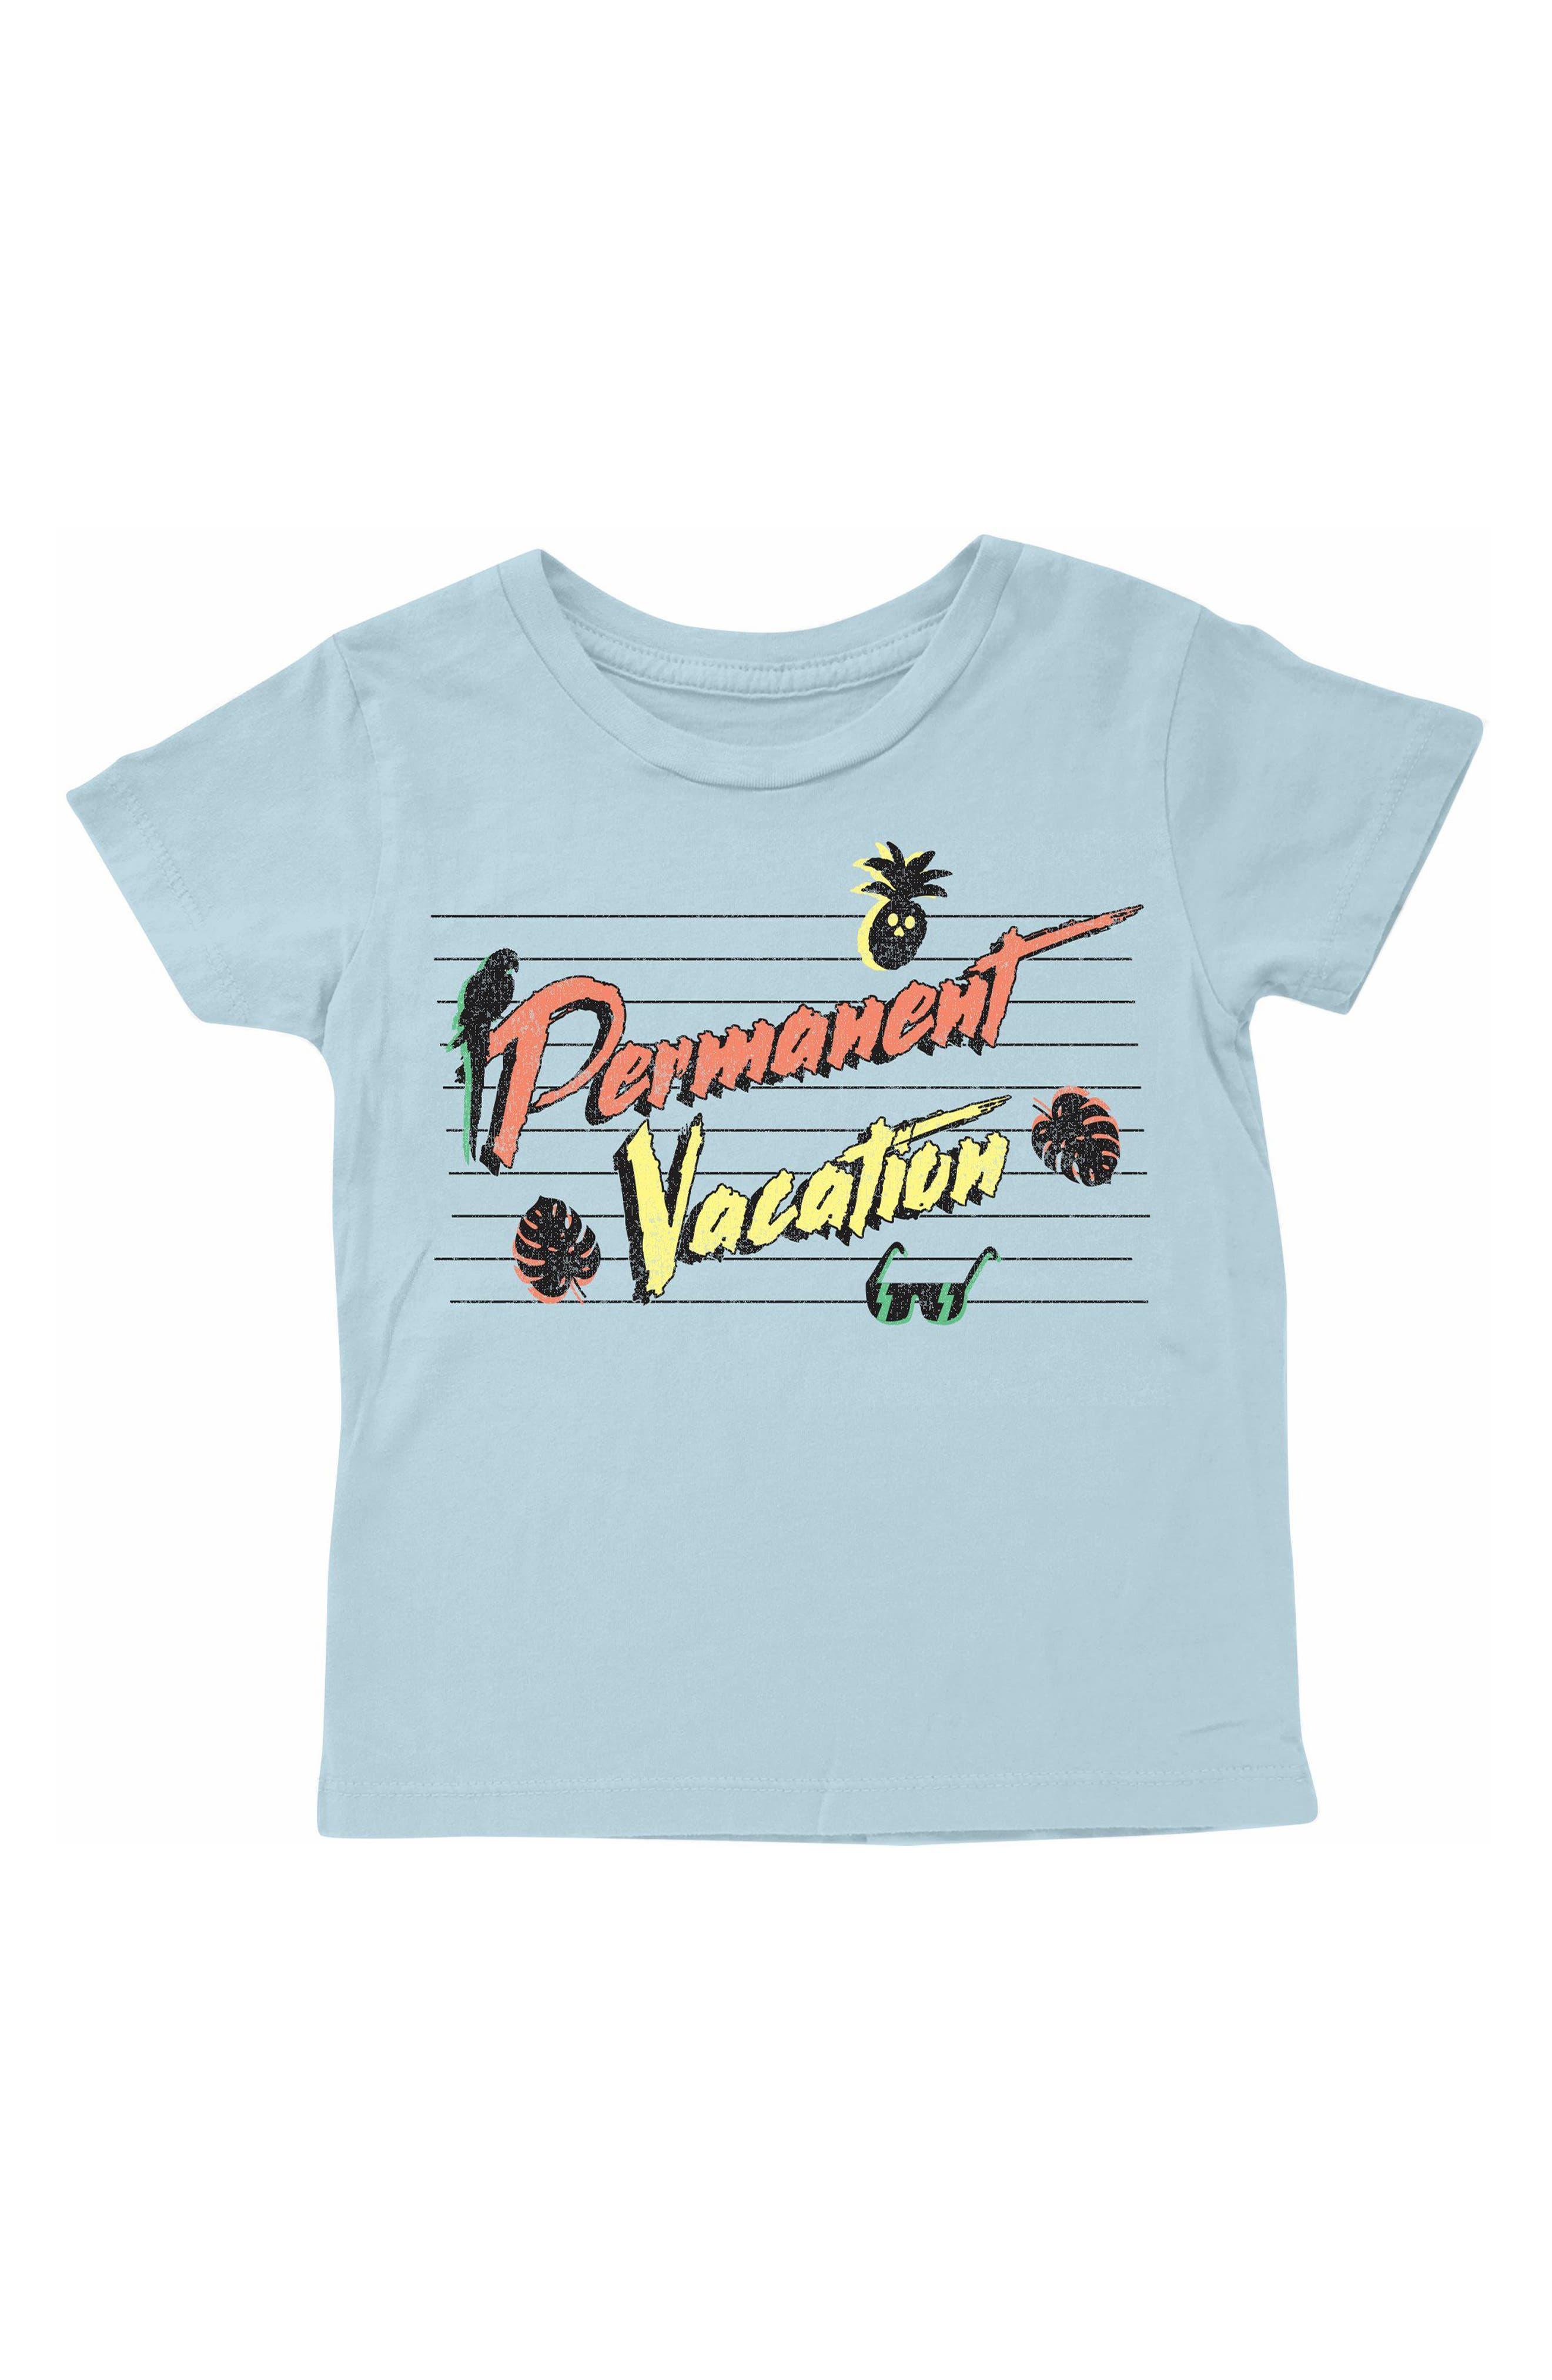 Permanent Vacation T-Shirt,                         Main,                         color, Light Blue